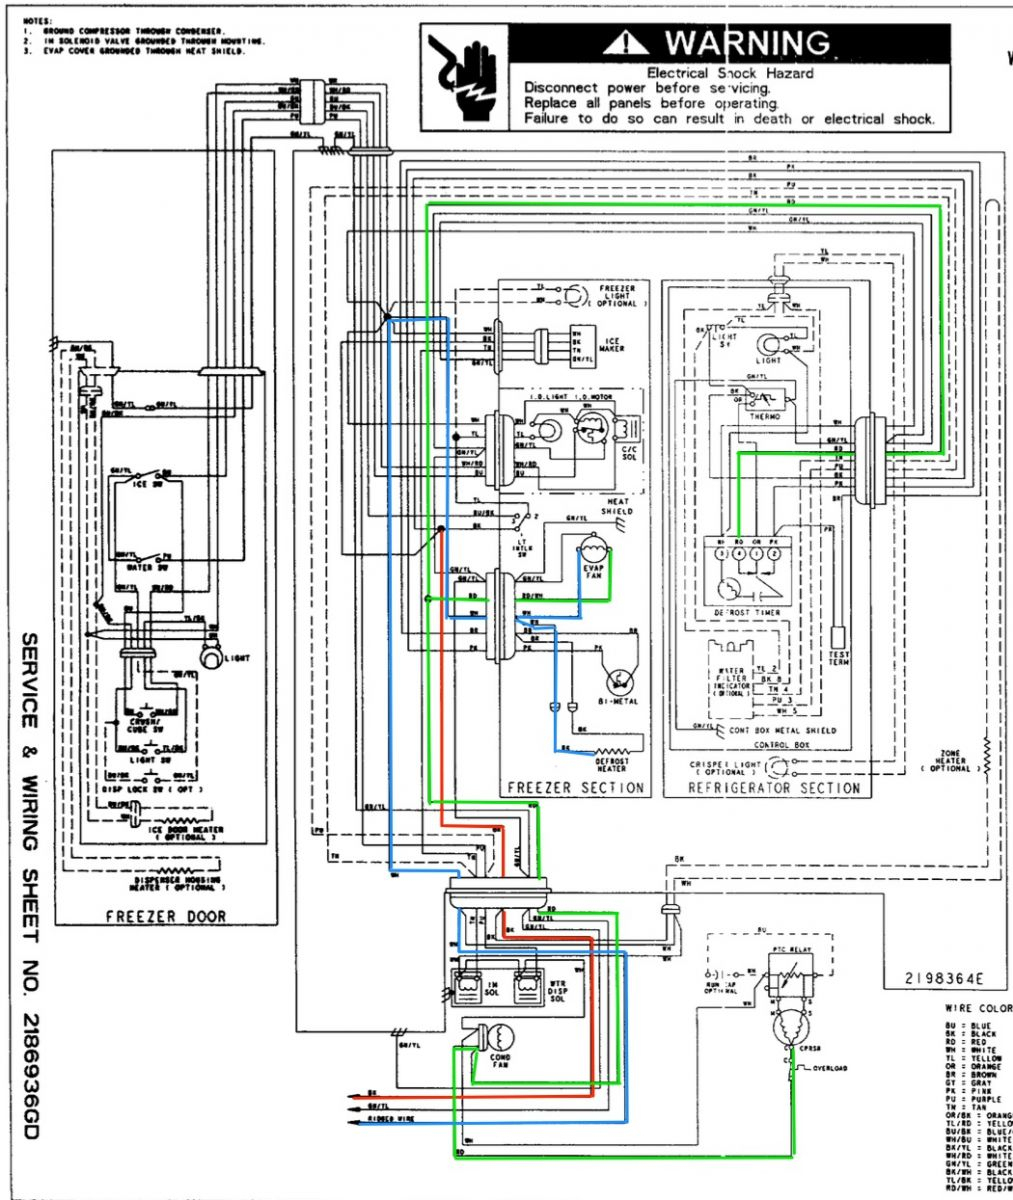 Whirlpool Ed25Rfxfw01 Refrigerator Wiring Diagram - The - Whirlpool Refrigerator Wiring Diagram